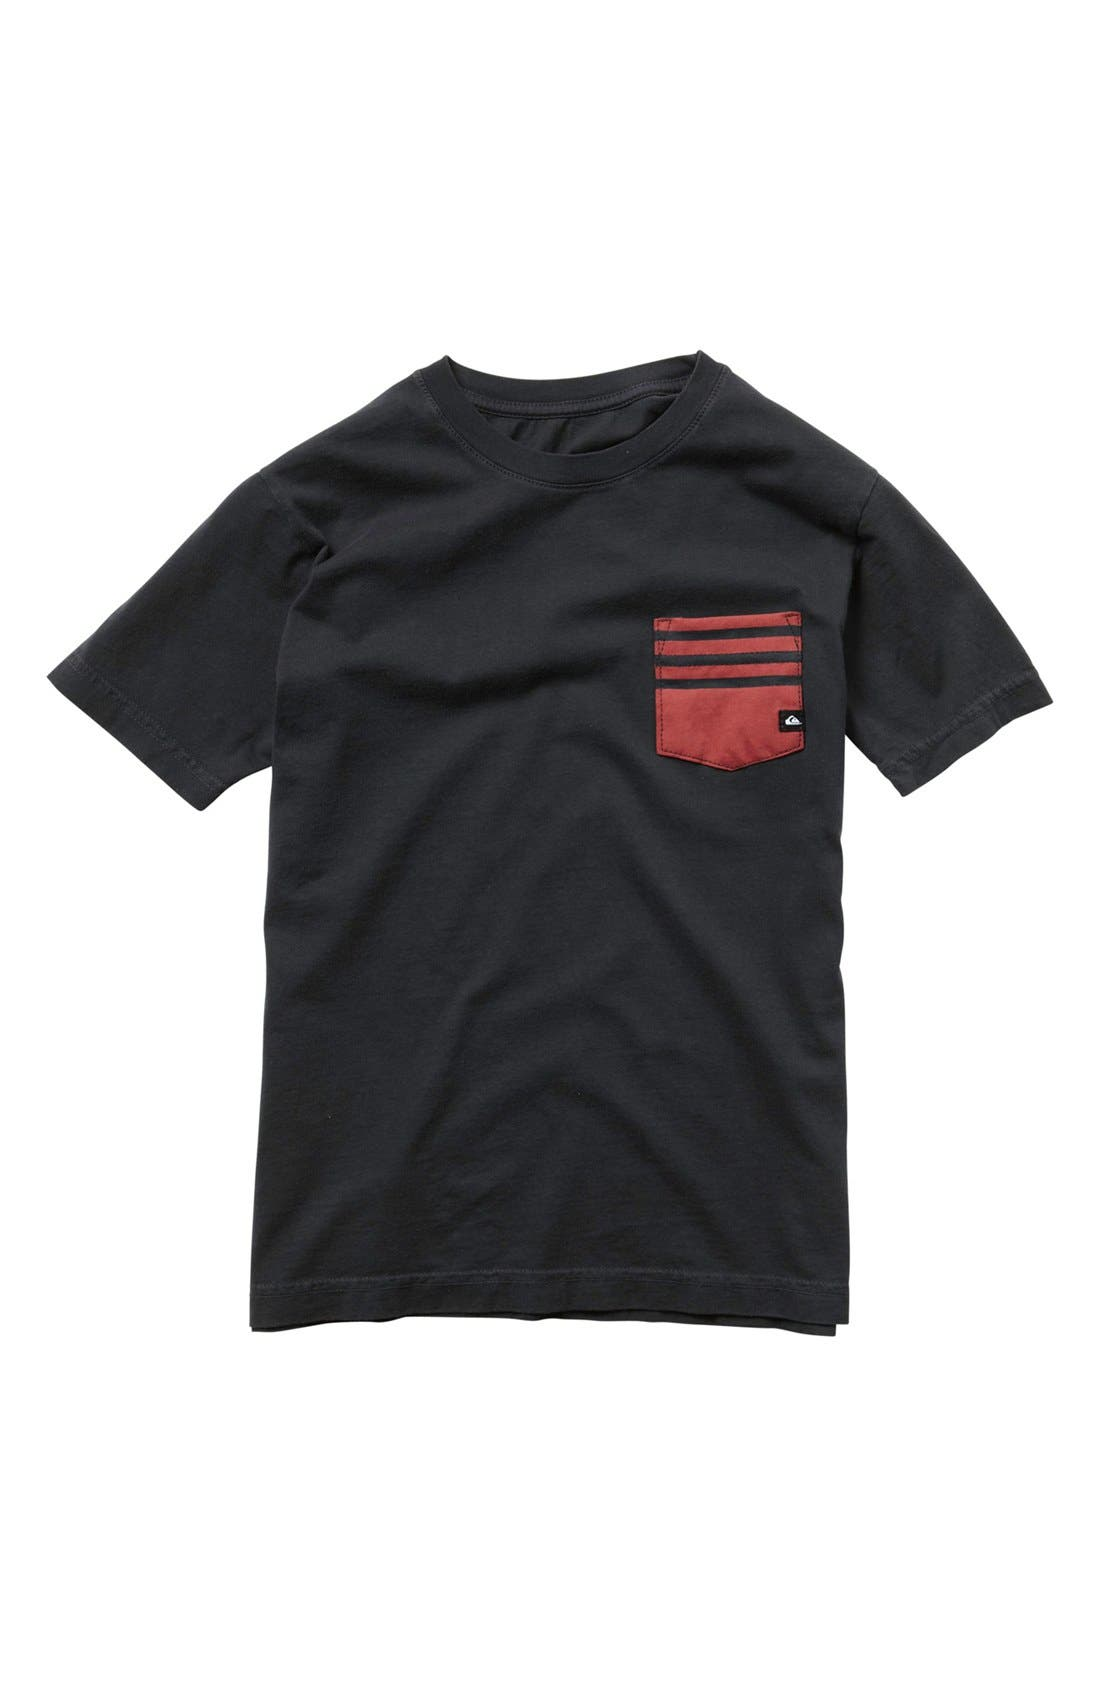 Main Image - Quiksilver Screenprinted T-Shirt (Big Boys)